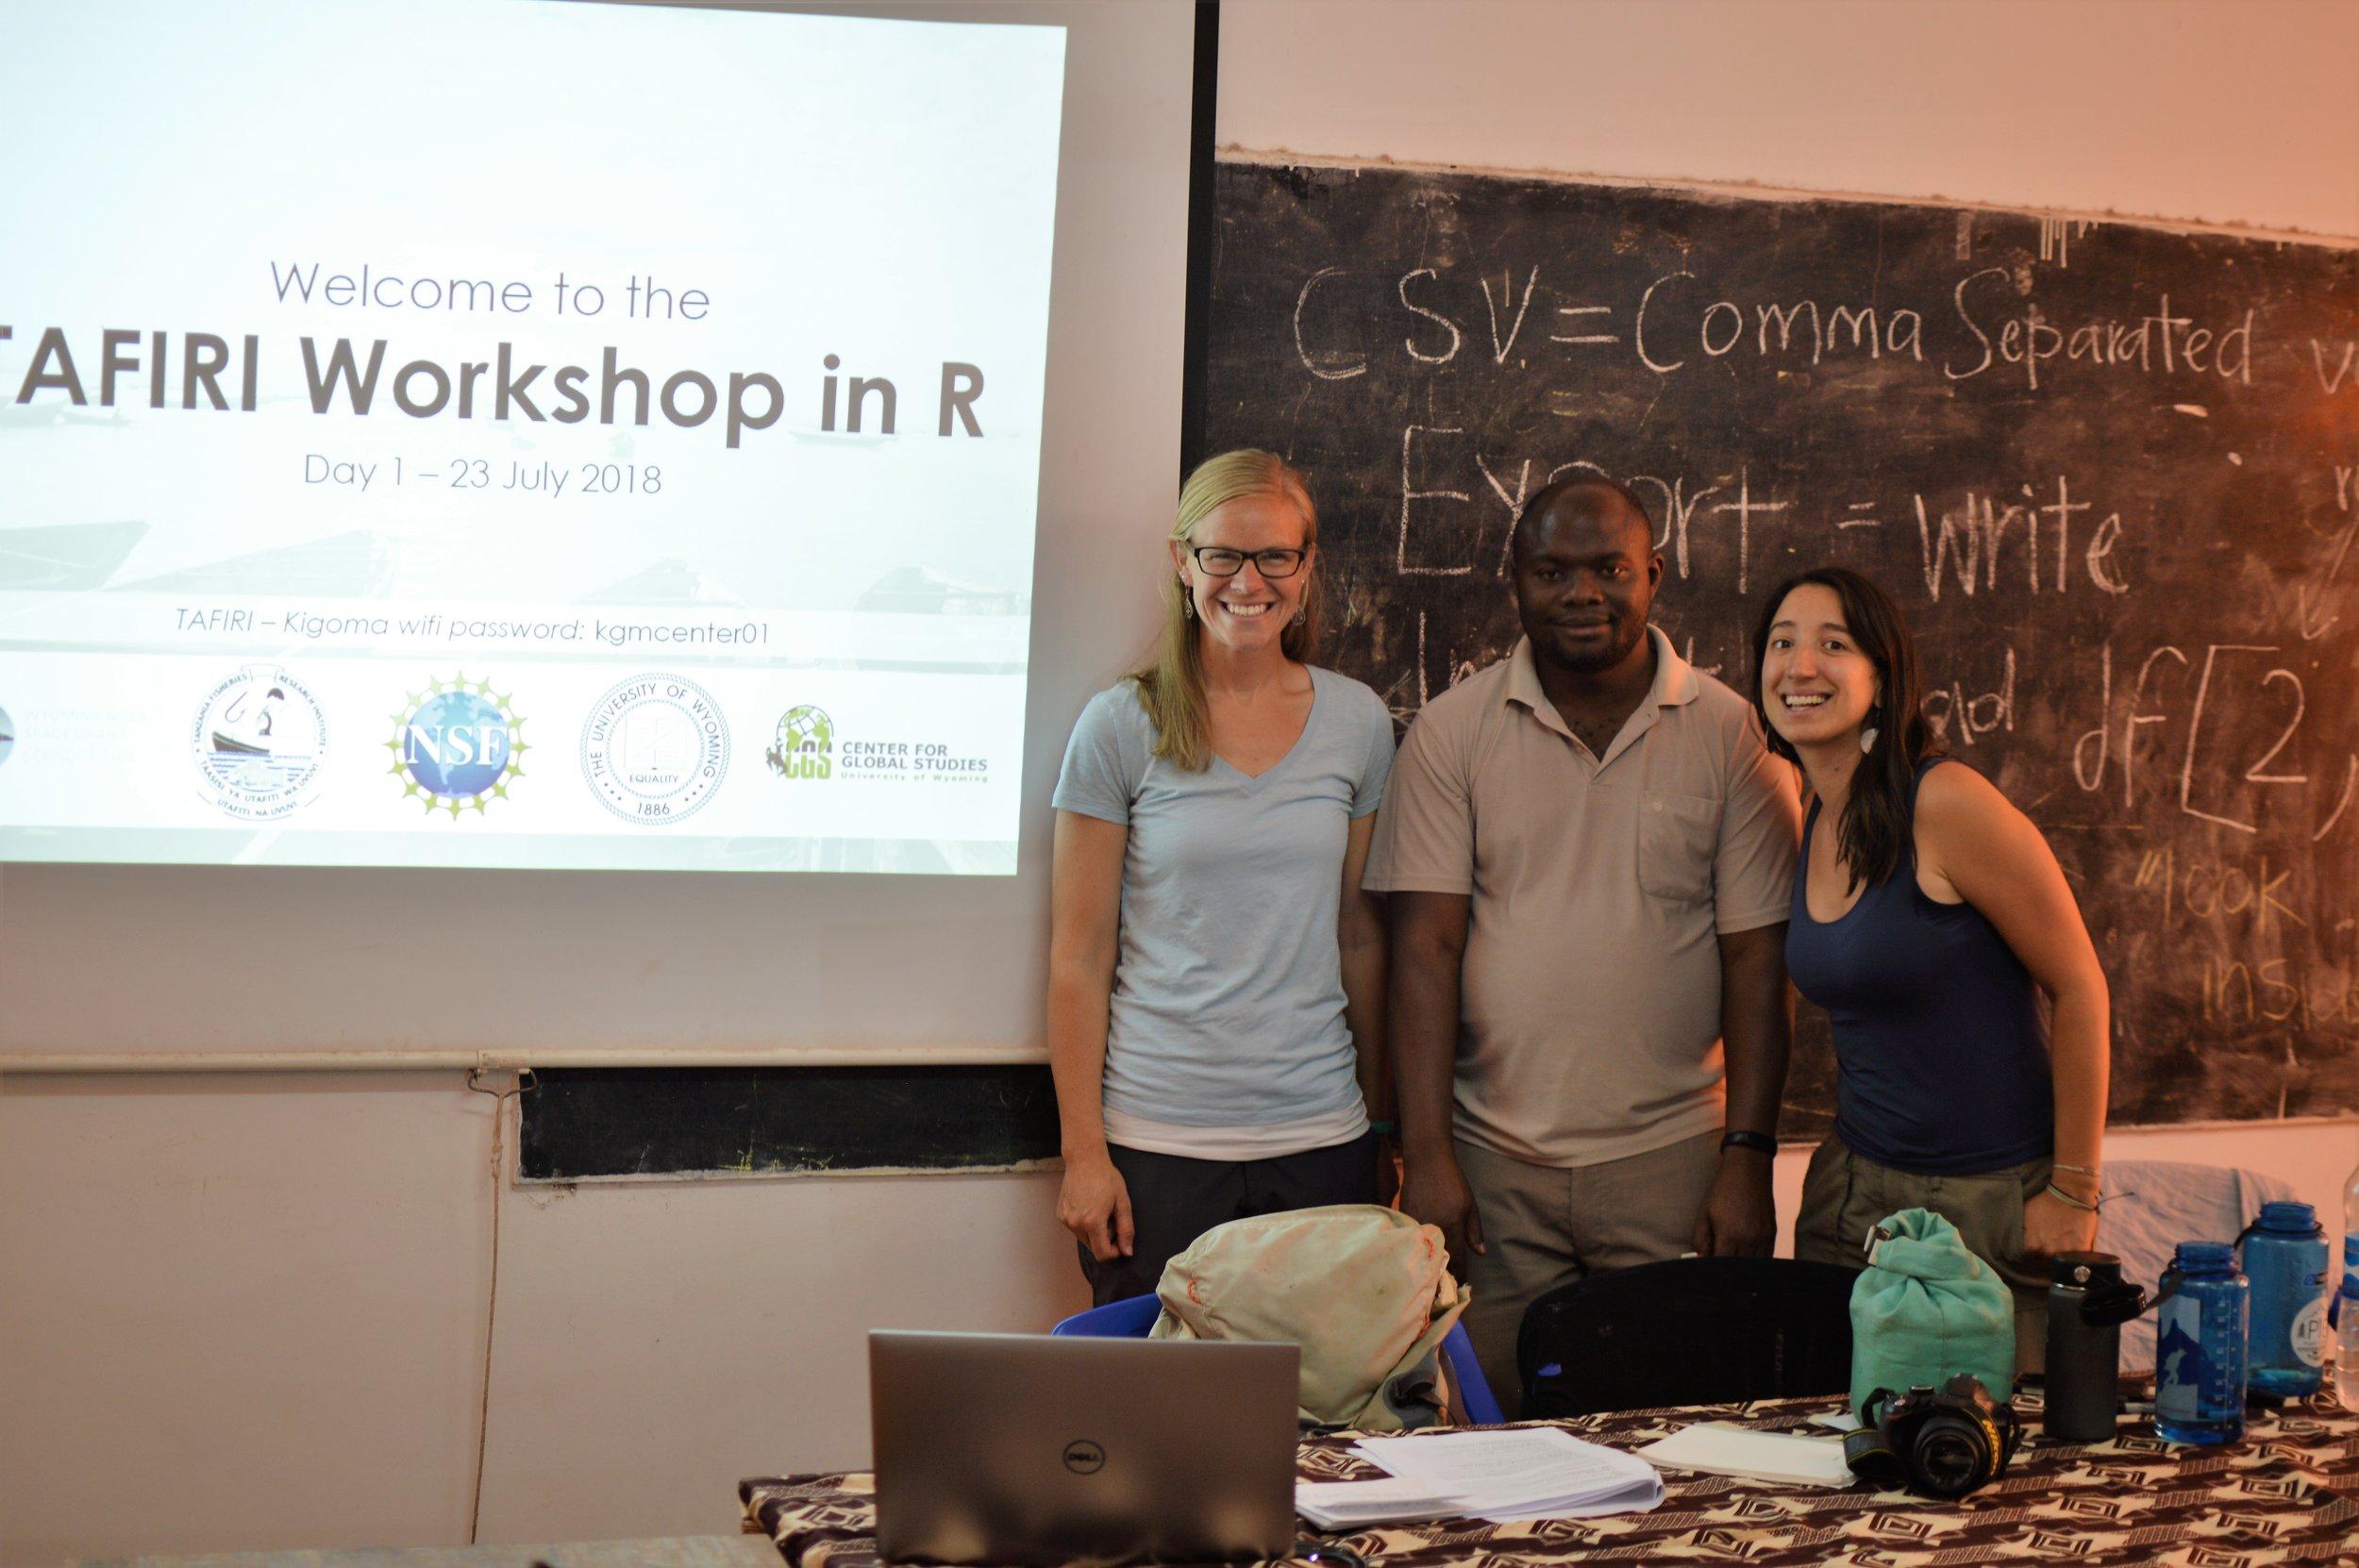 Instructors of the TAFIRI Workshop in R, July 2018 —  (L to R) Jessica Rick (Univ of Wyoming), Masumbuko Semba (Univ of Dar es Salaam), Jimena Golcher-Benavides (Univ of Wyoming)